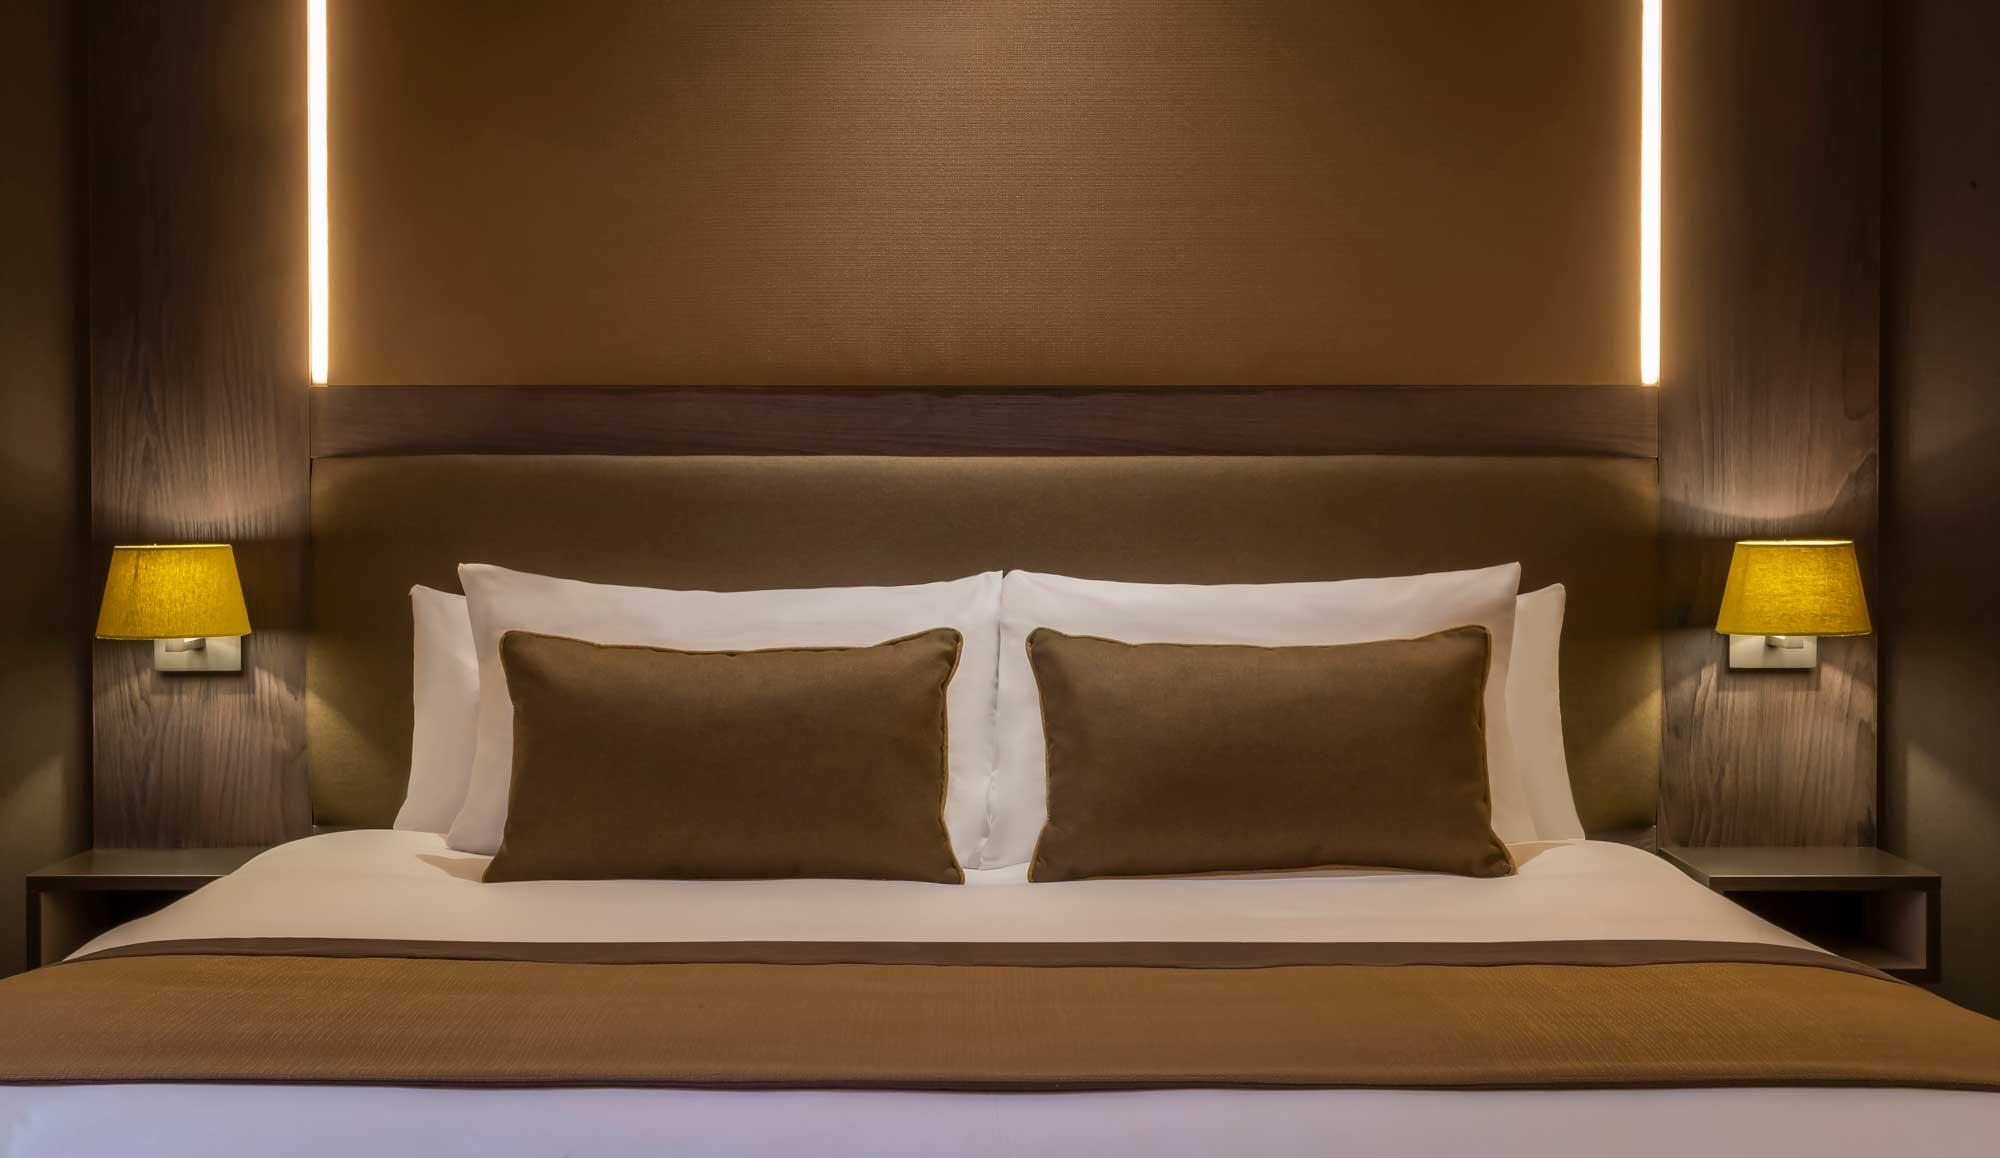 Belvedere-Hotel-Dublin-Superior-Room-double-bed